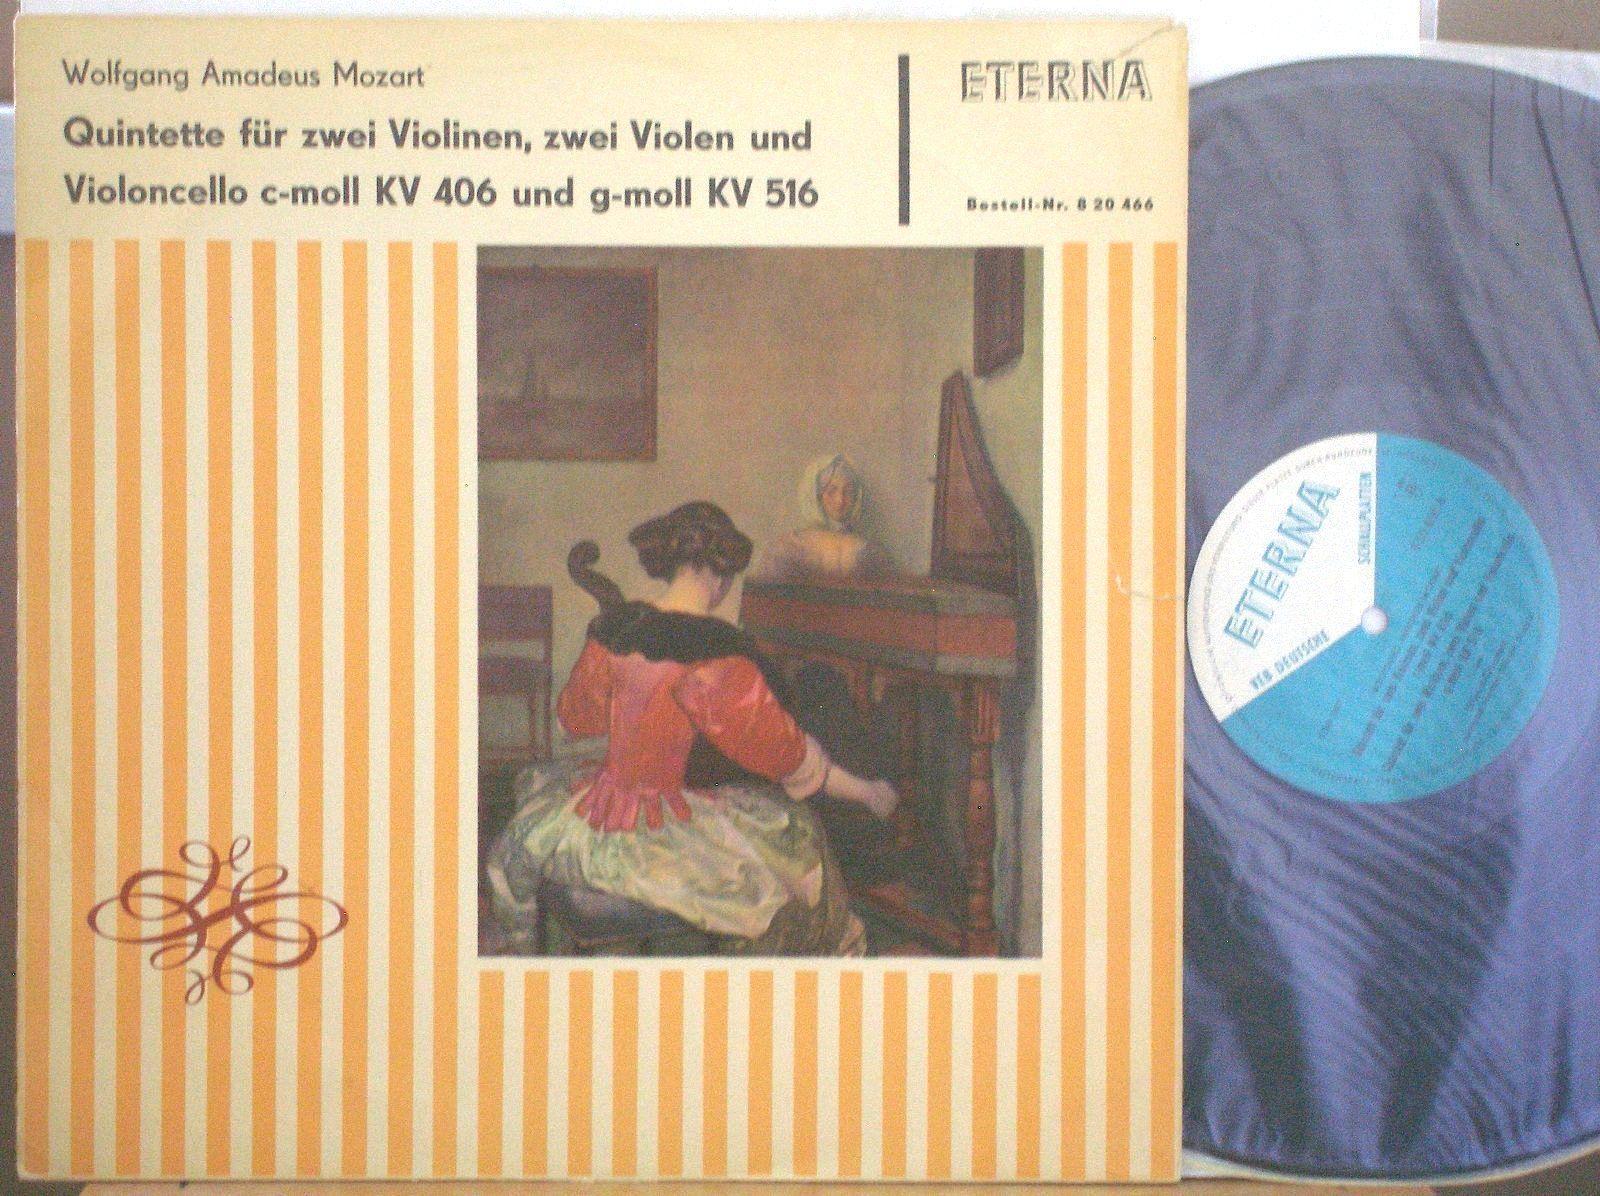 ULBRICH-QUARTETT Mozart String Quintett KV406/516 ETERNA 820466 MONO ED1